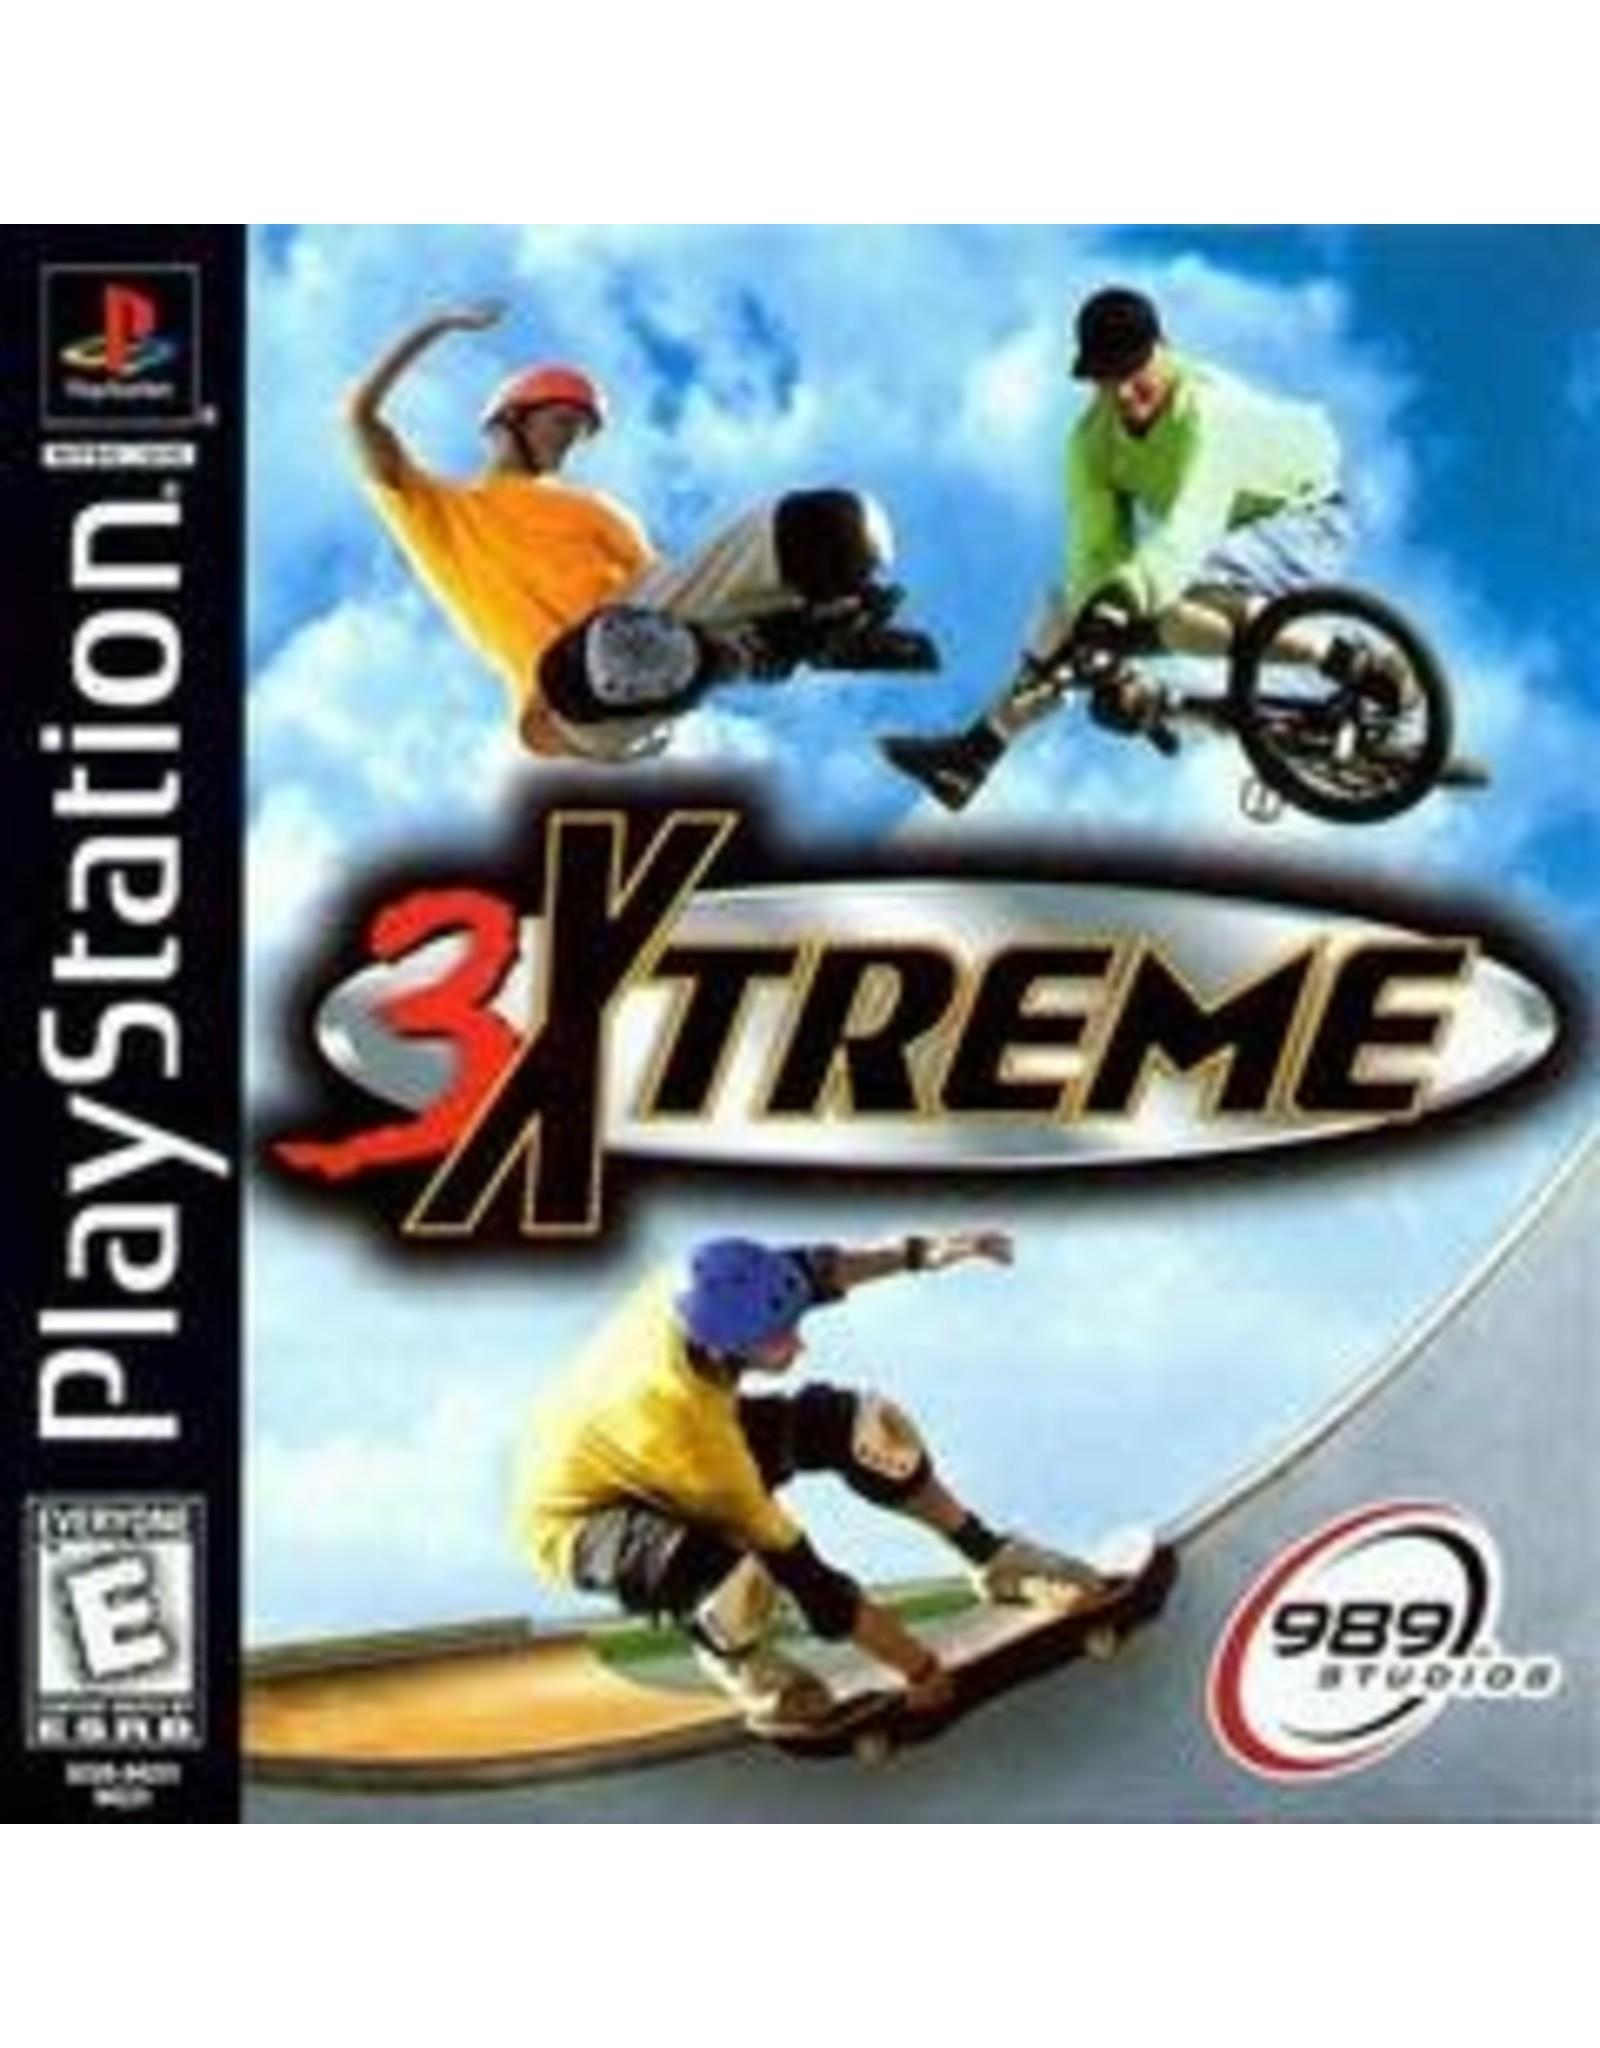 Playstation 3Xtreme (CiB)